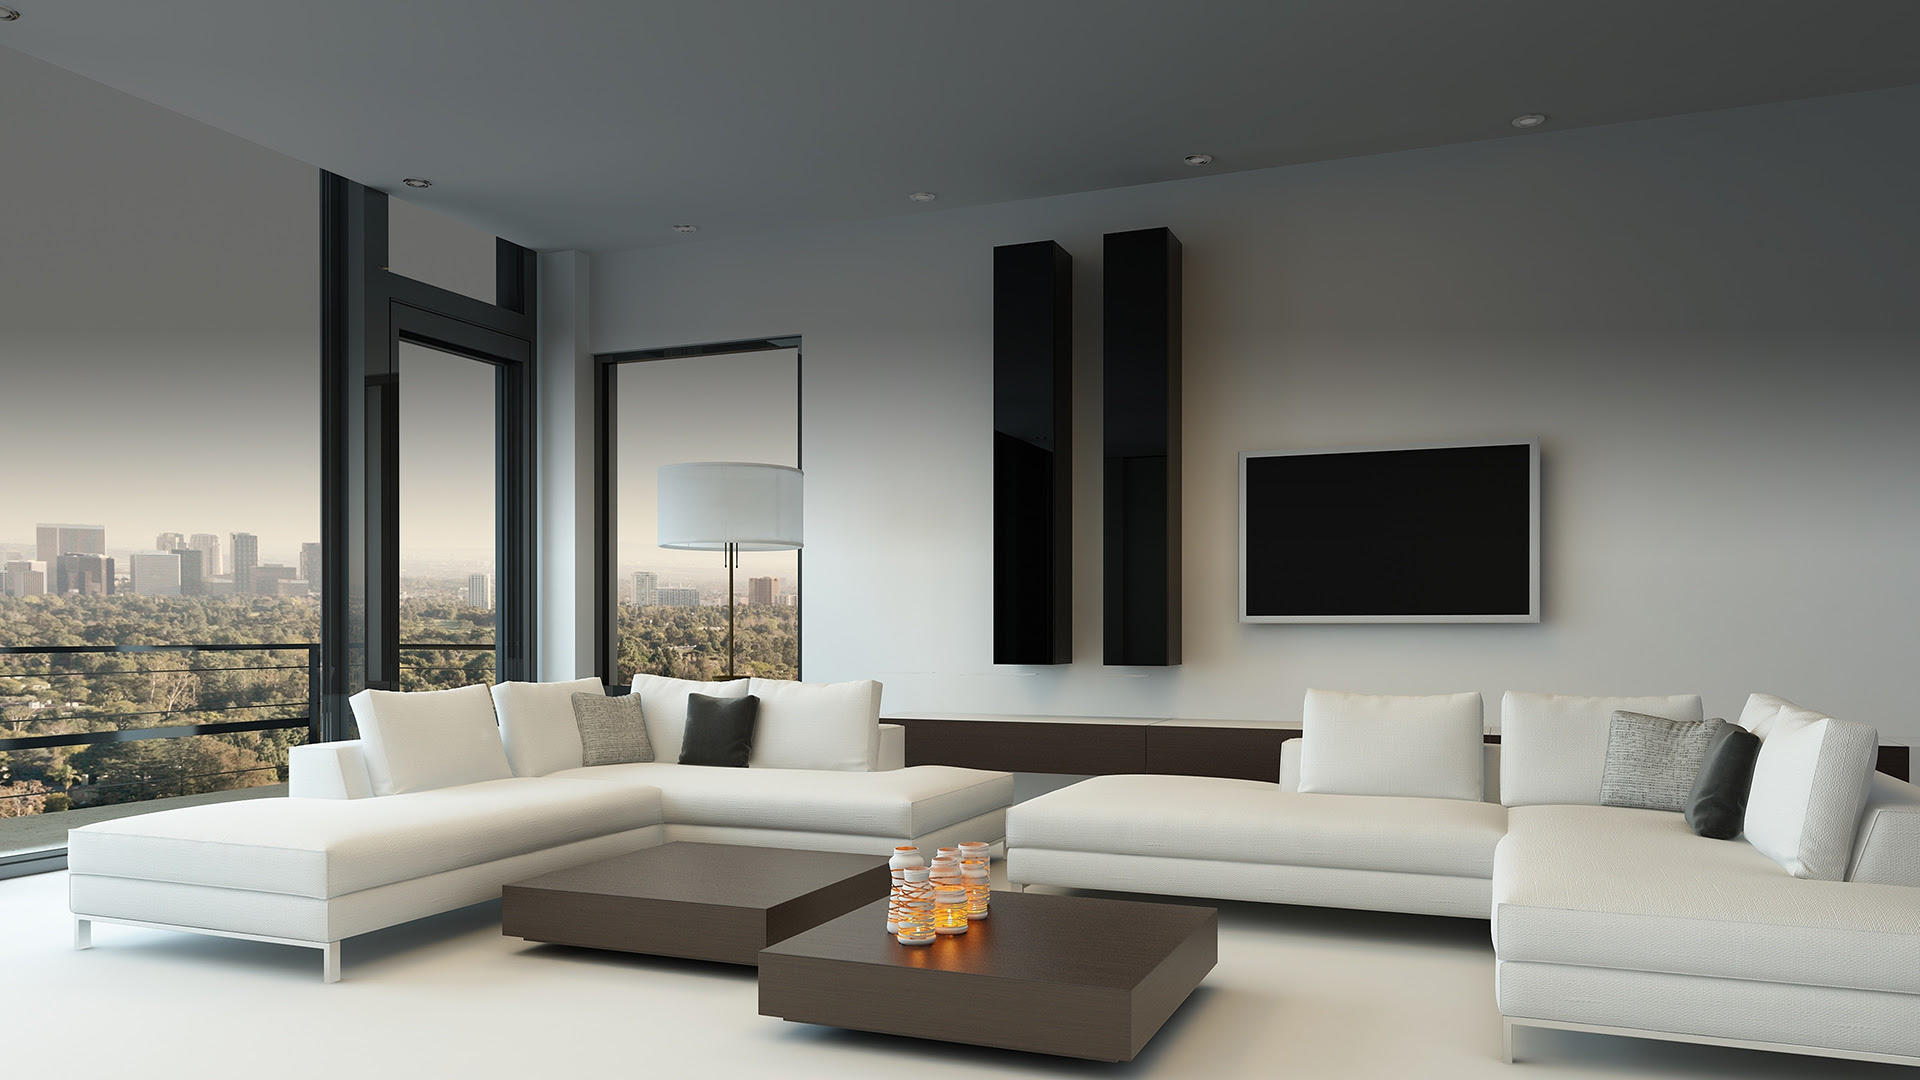 Affordable Interior Design Services in Torrance